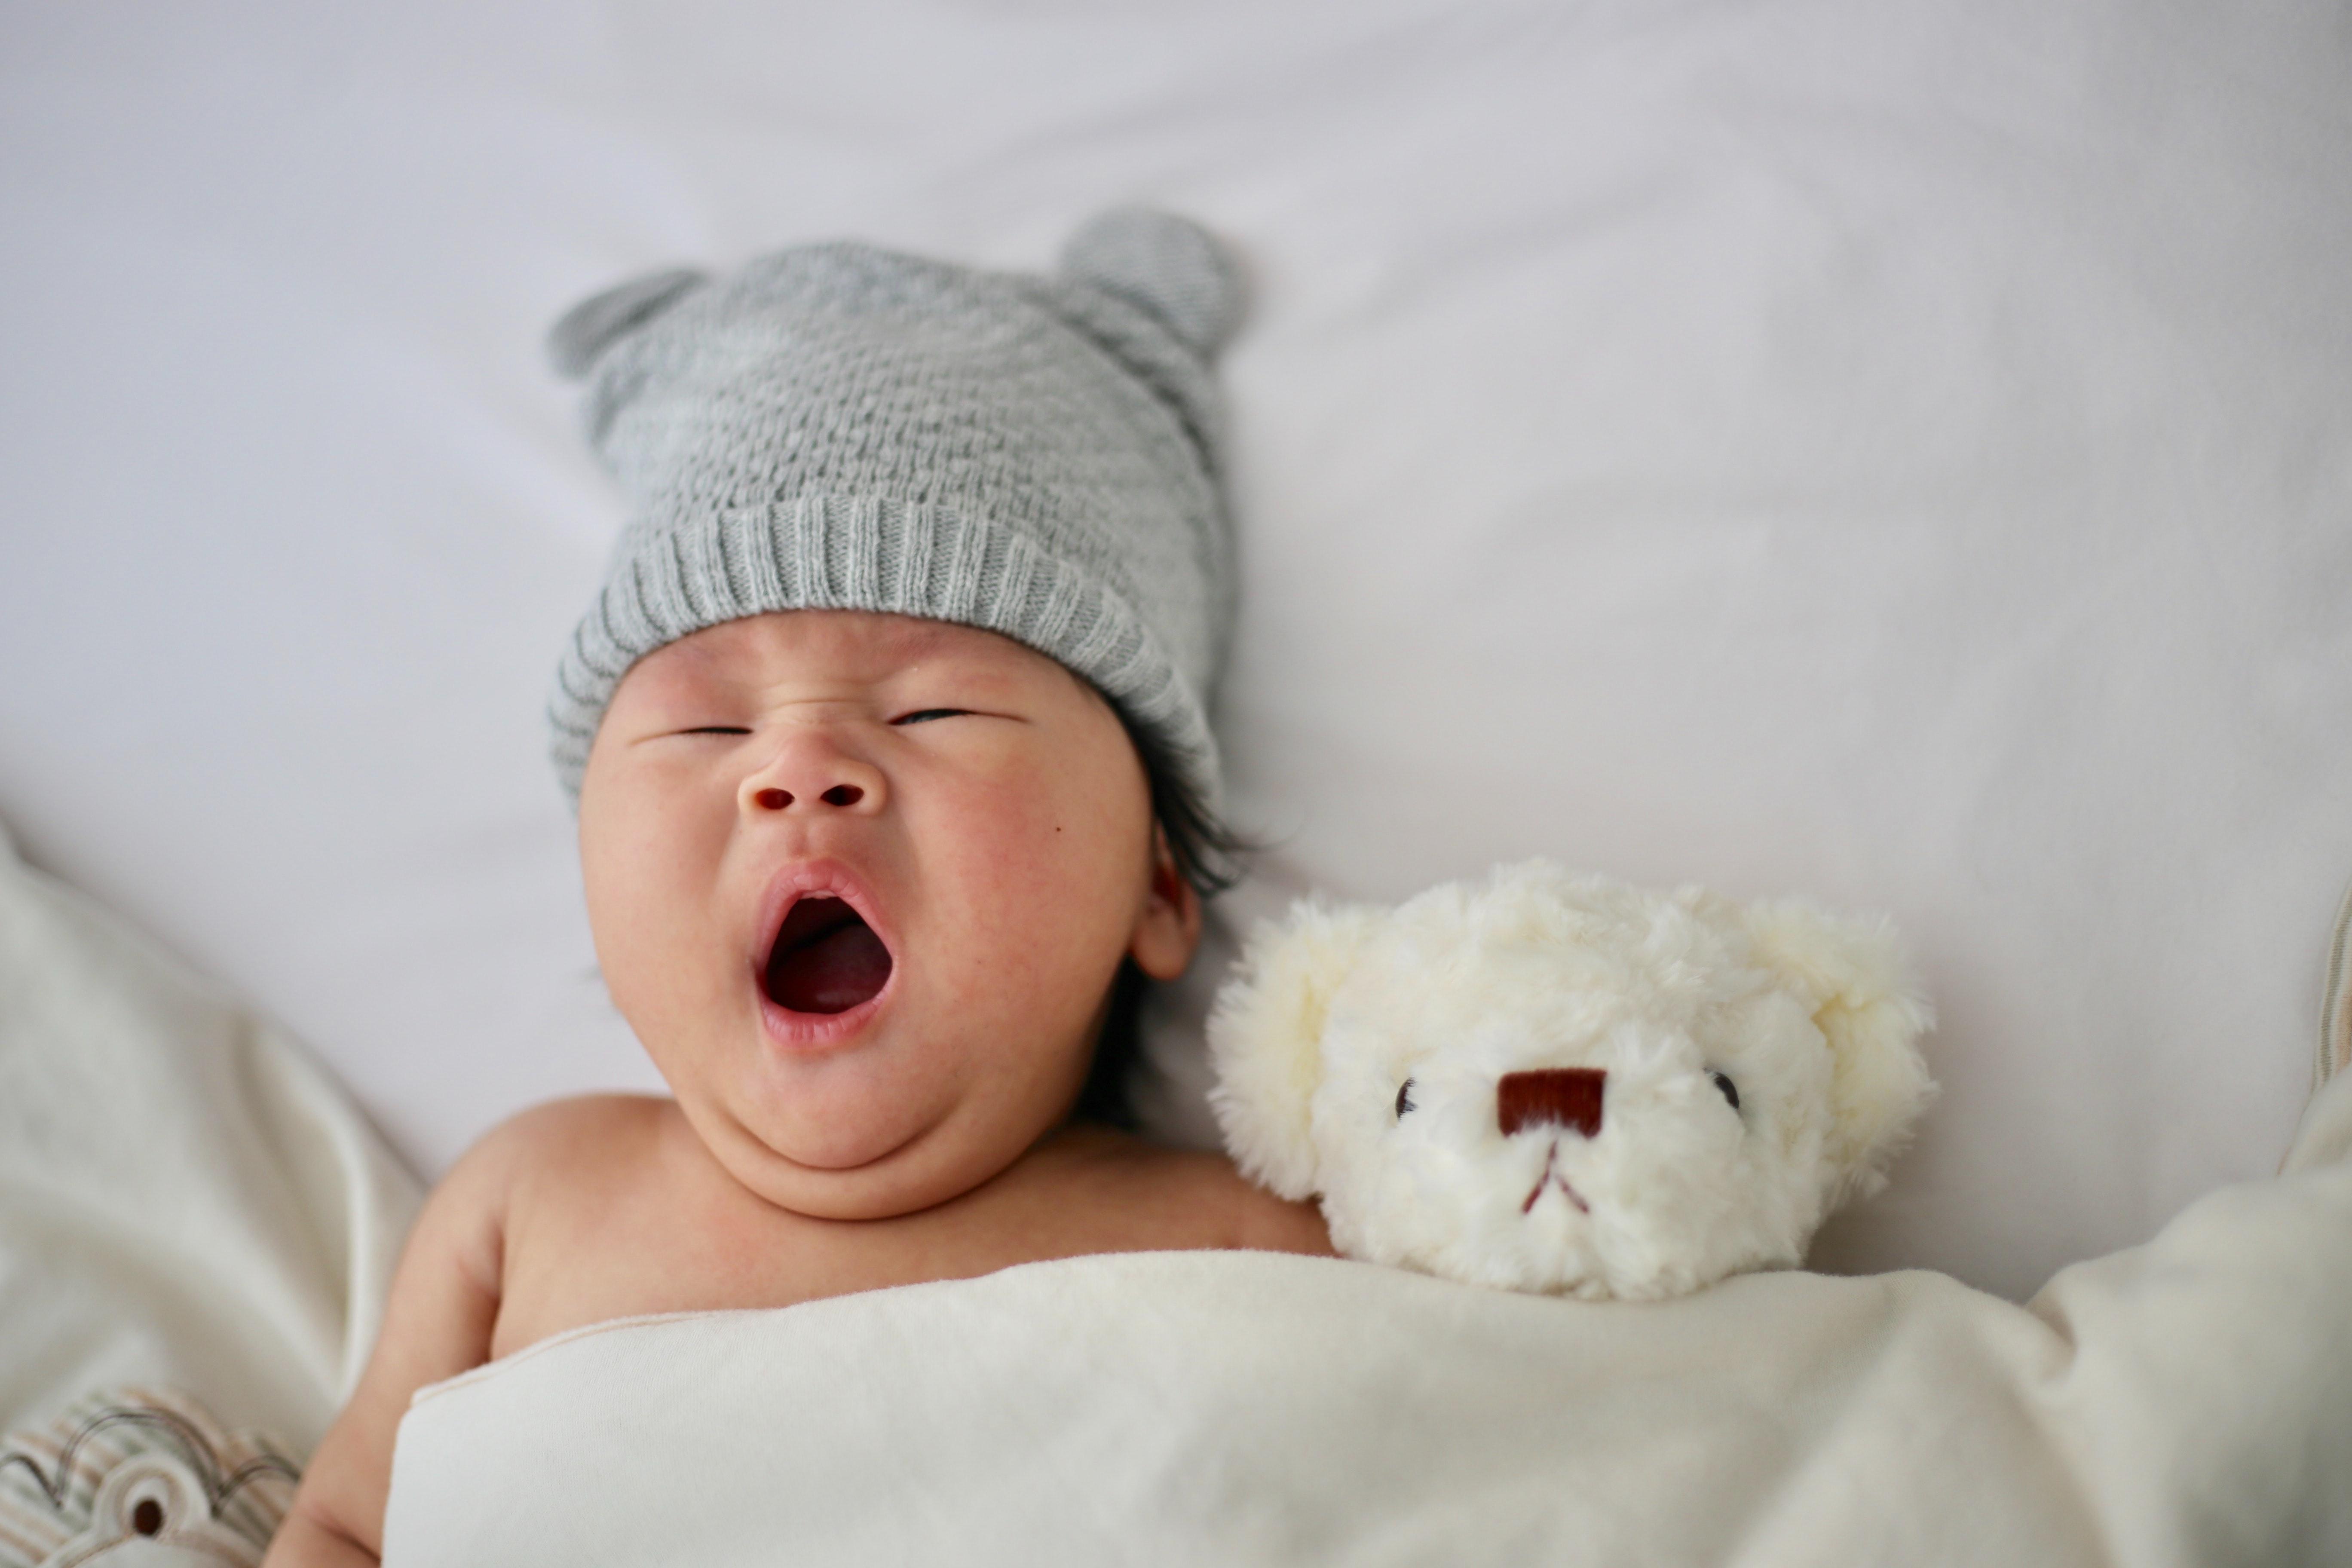 baby yawning next to teddy bear